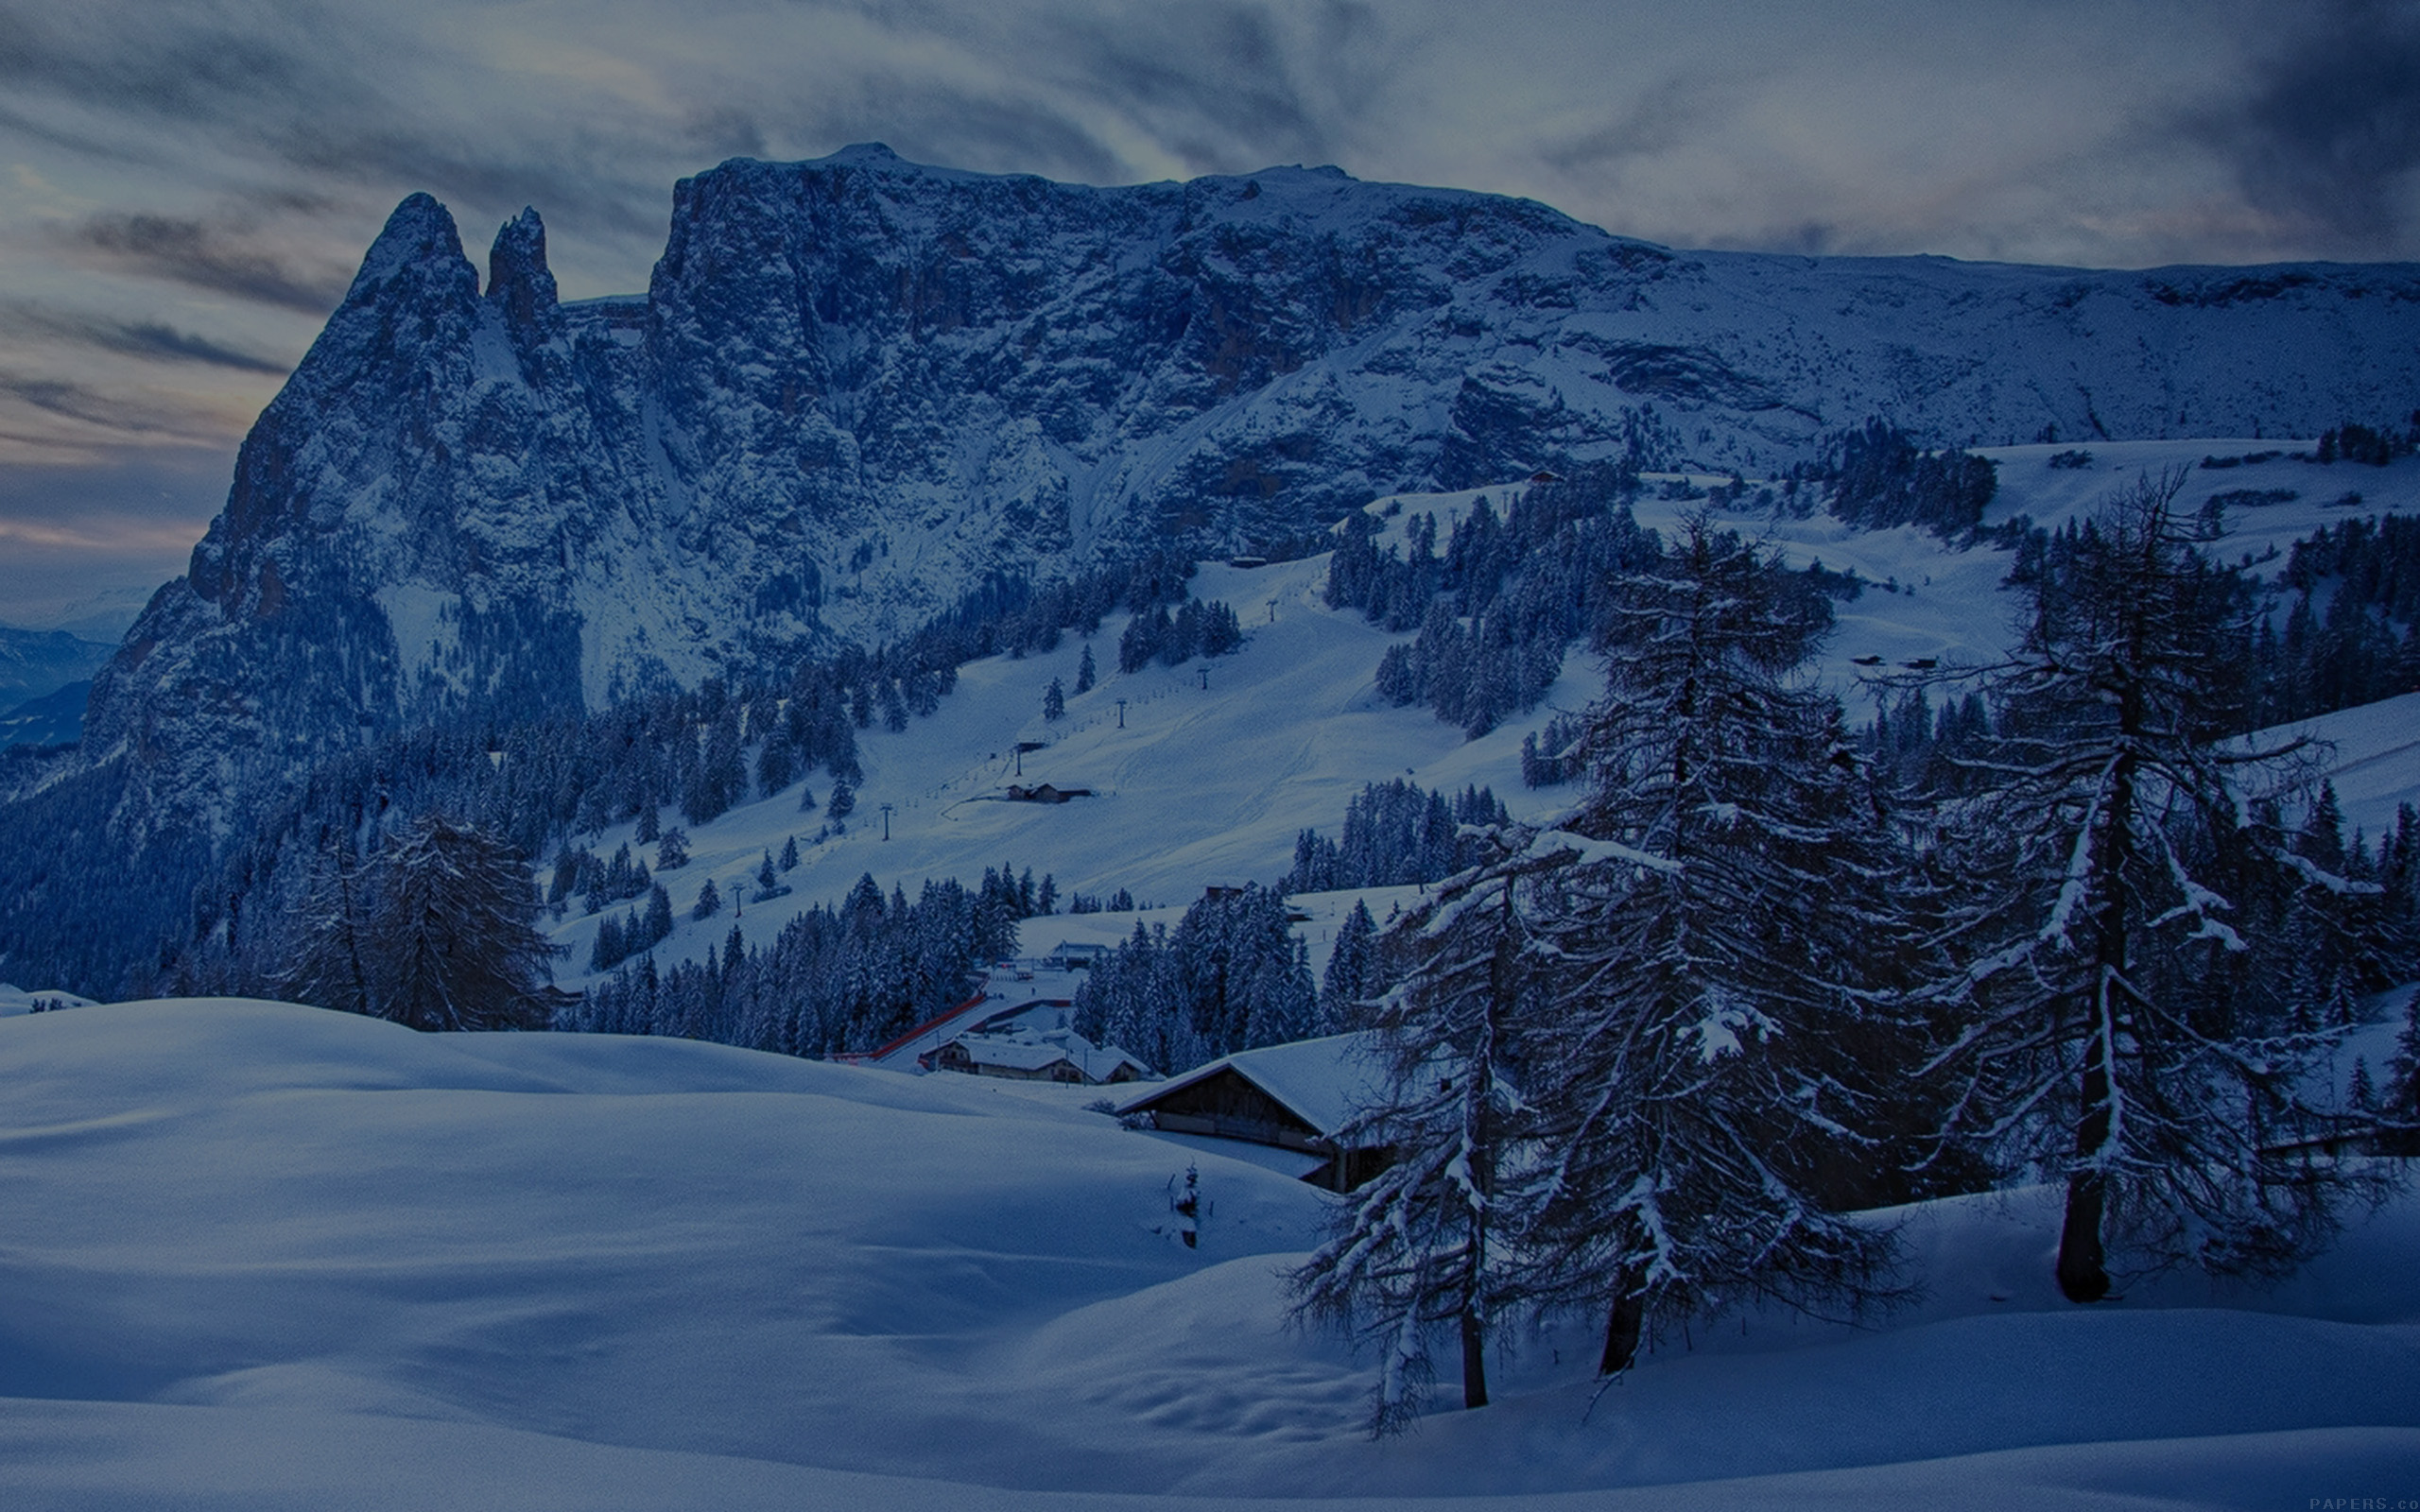 mr45-mountain-blue-snow-winter-nature-ski-dark